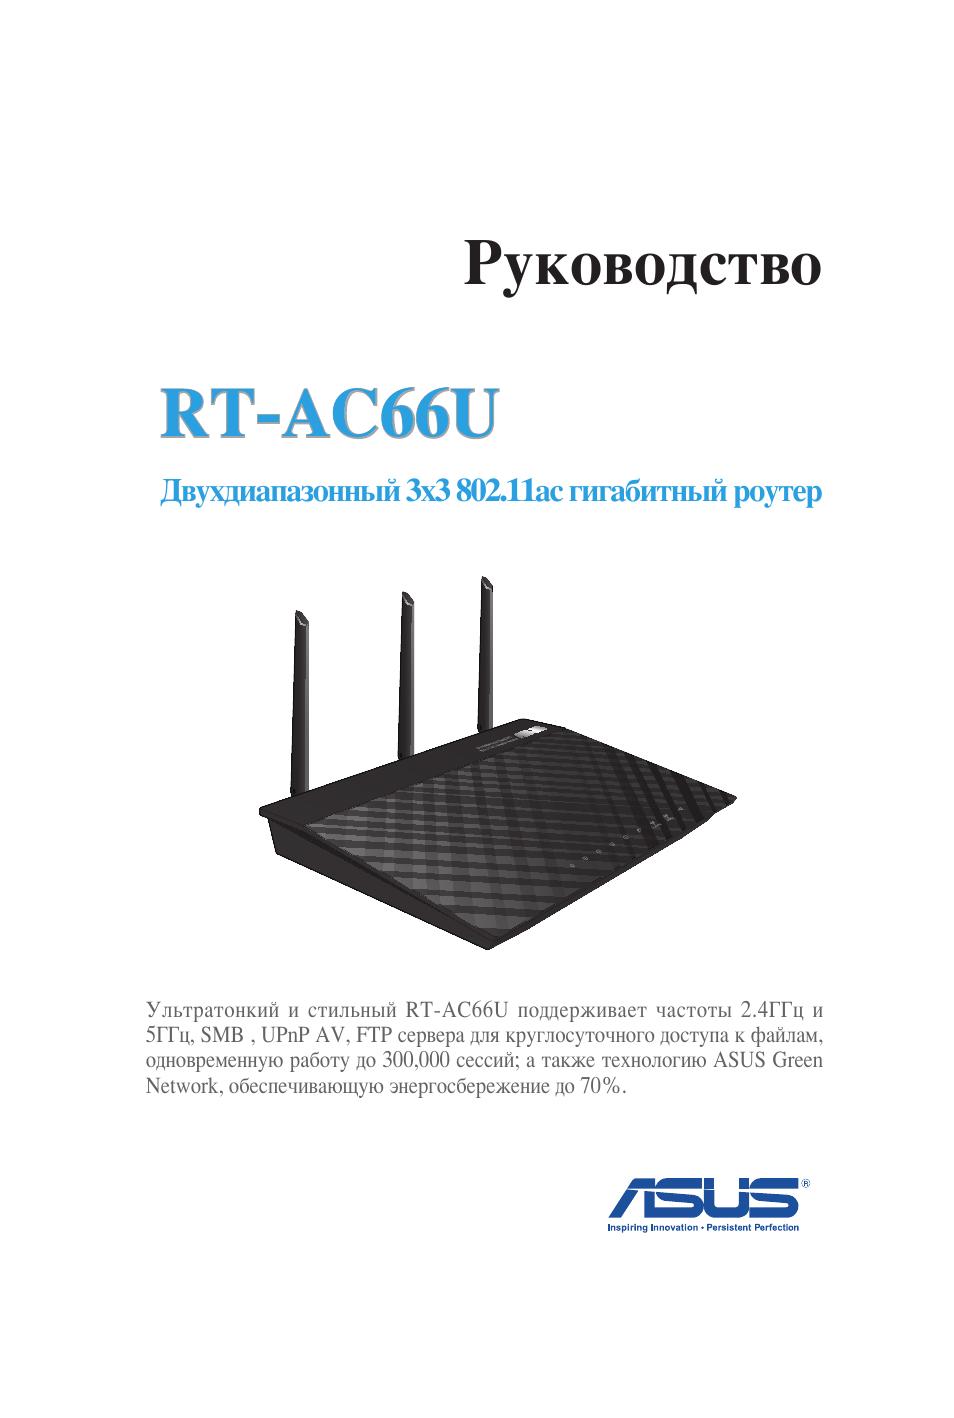 Инструкция по эксплуатации Asus RT-AC66U 70 страниц